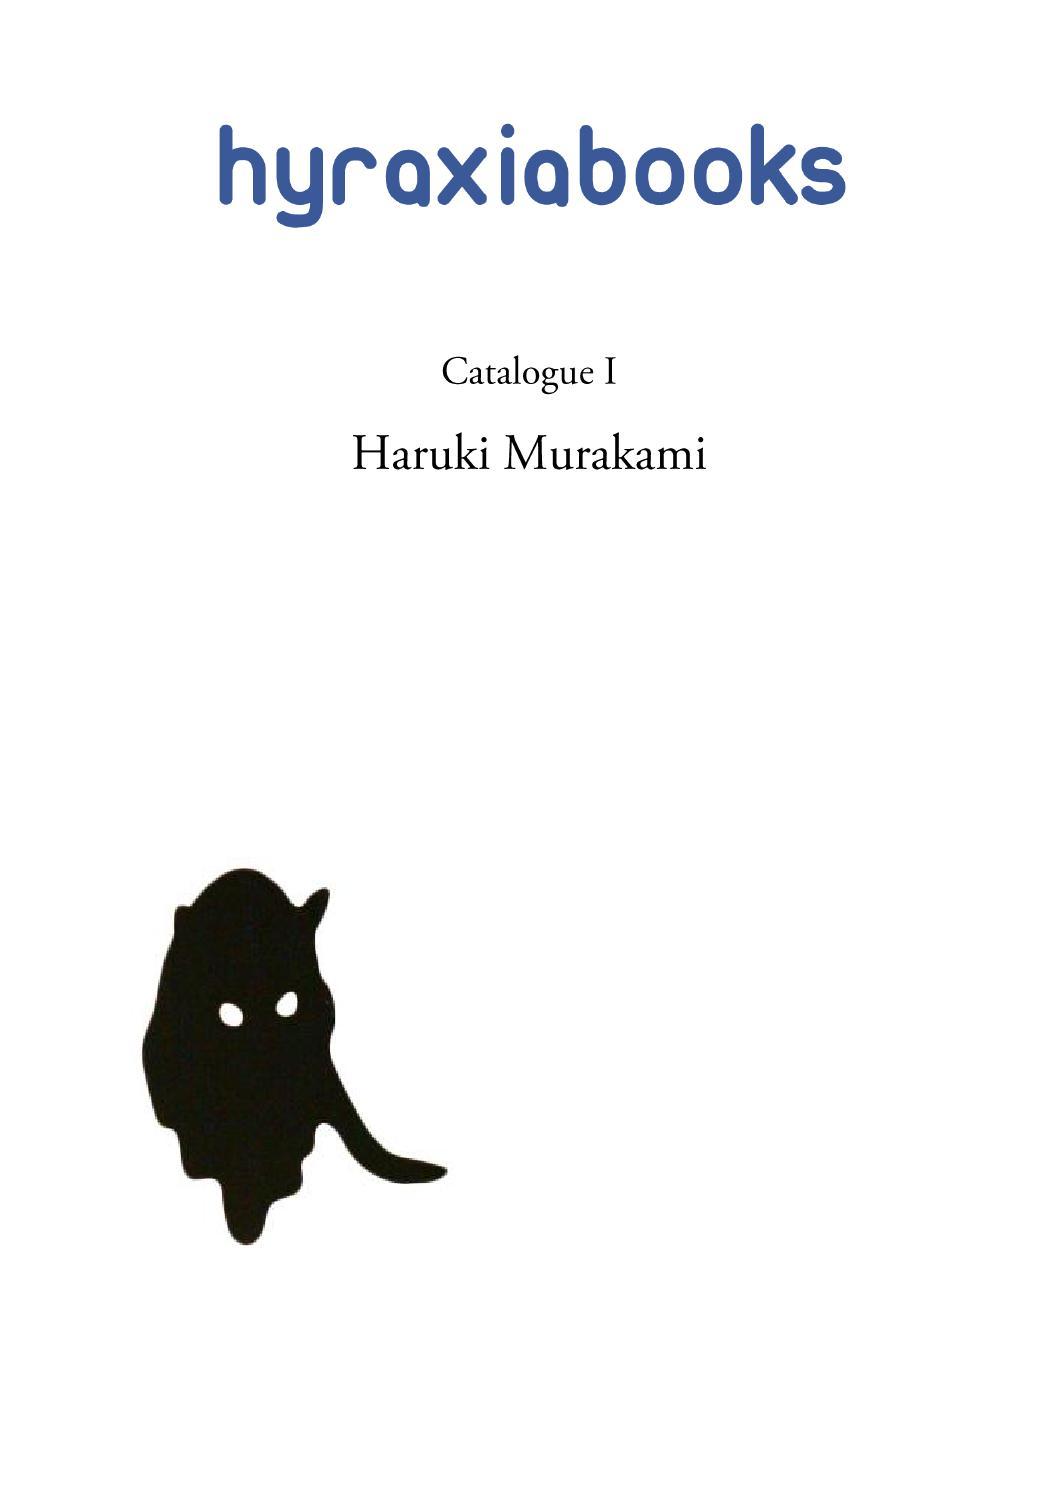 Hyraxia Books Catalogue 1 Haruki Murakami by Simon